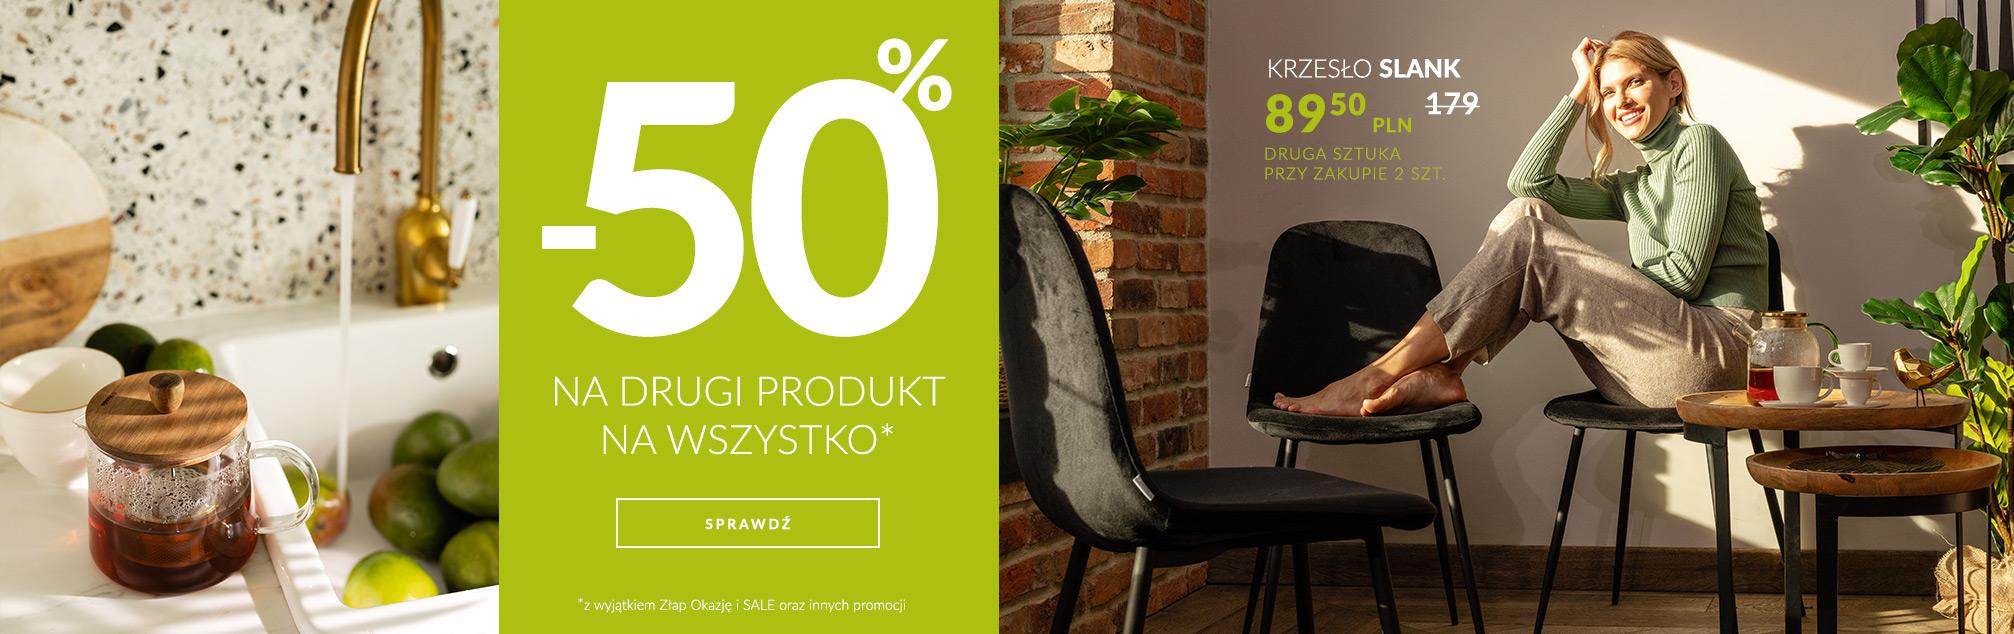 Homla: 50% rabatu na drugi produkt z całego asortymentu